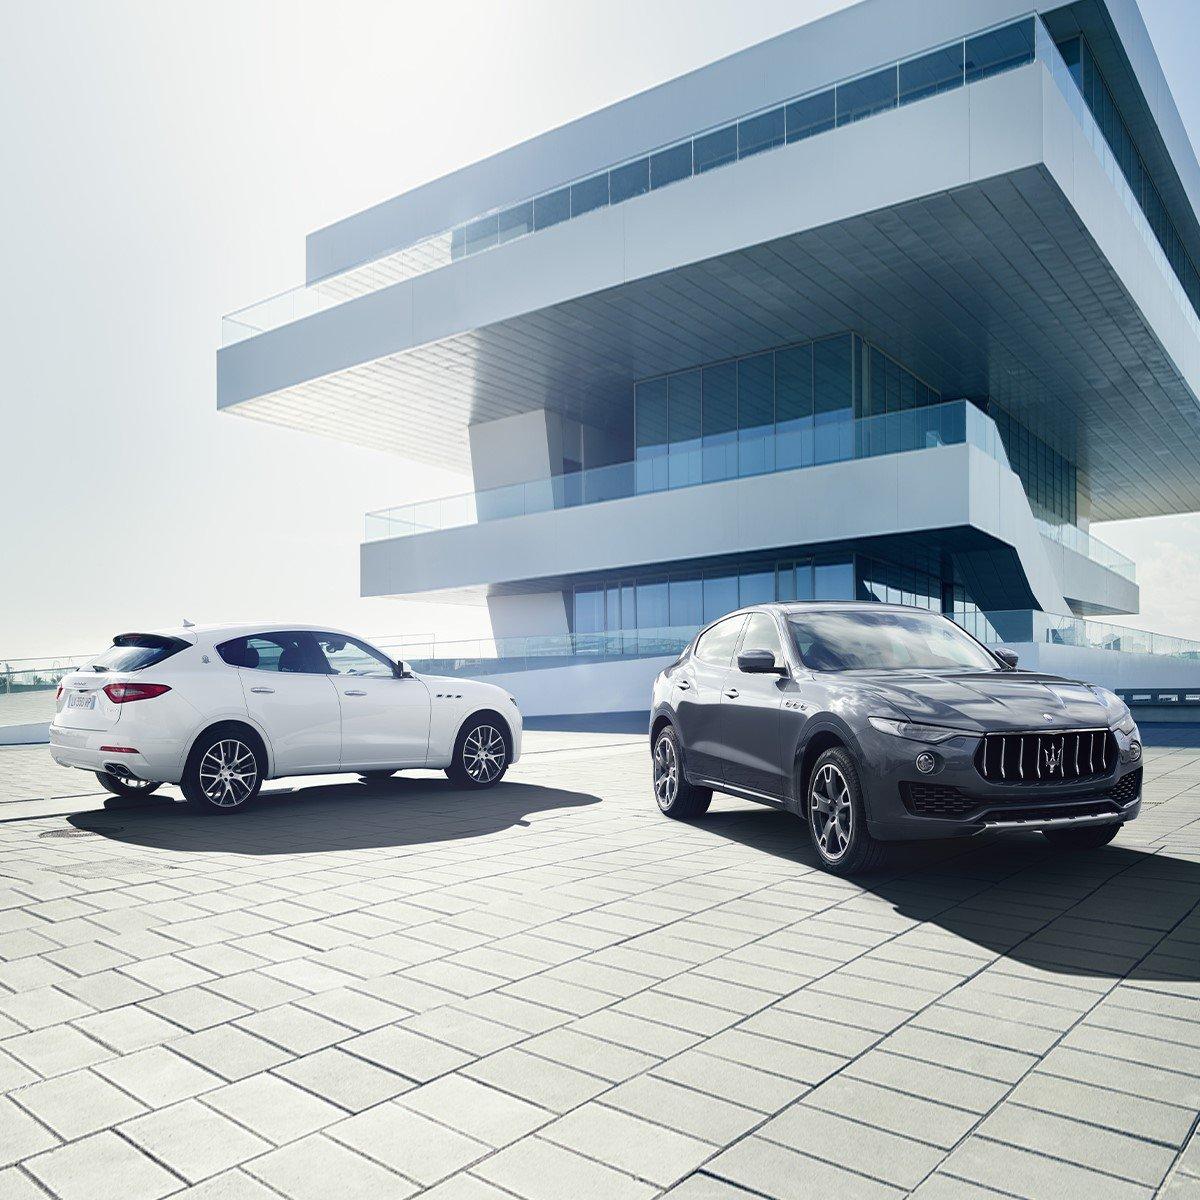 An impressive duo for all the new possibilities ahead. 👉 https://t.co/oDHIkaovsf 📱 (415)526-7300 #Maserati #MaseratiLevante https://t.co/TSKyPAVxzh